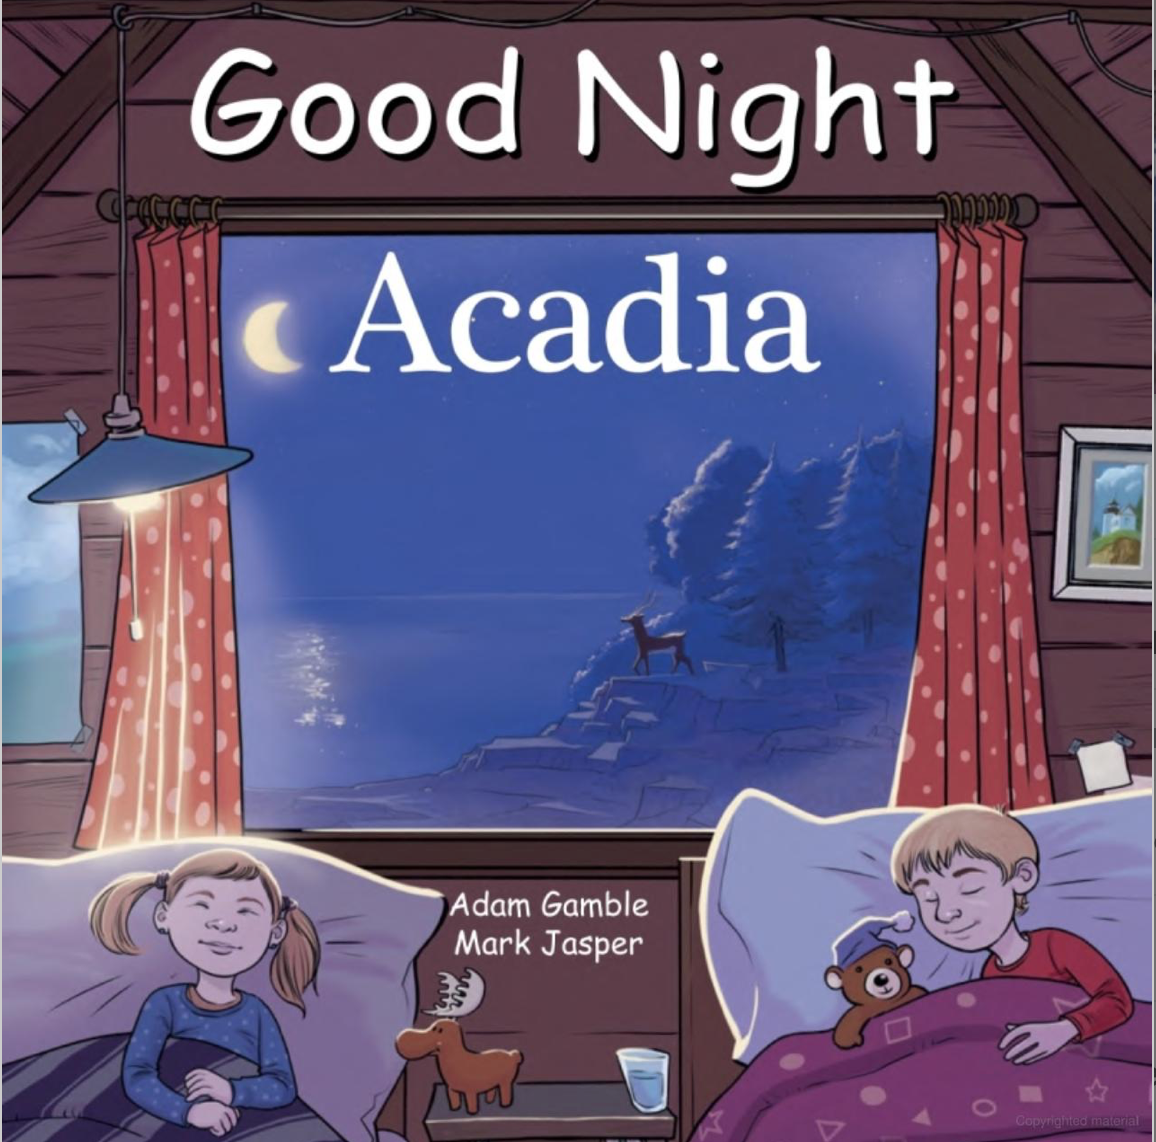 Good Night Acadia